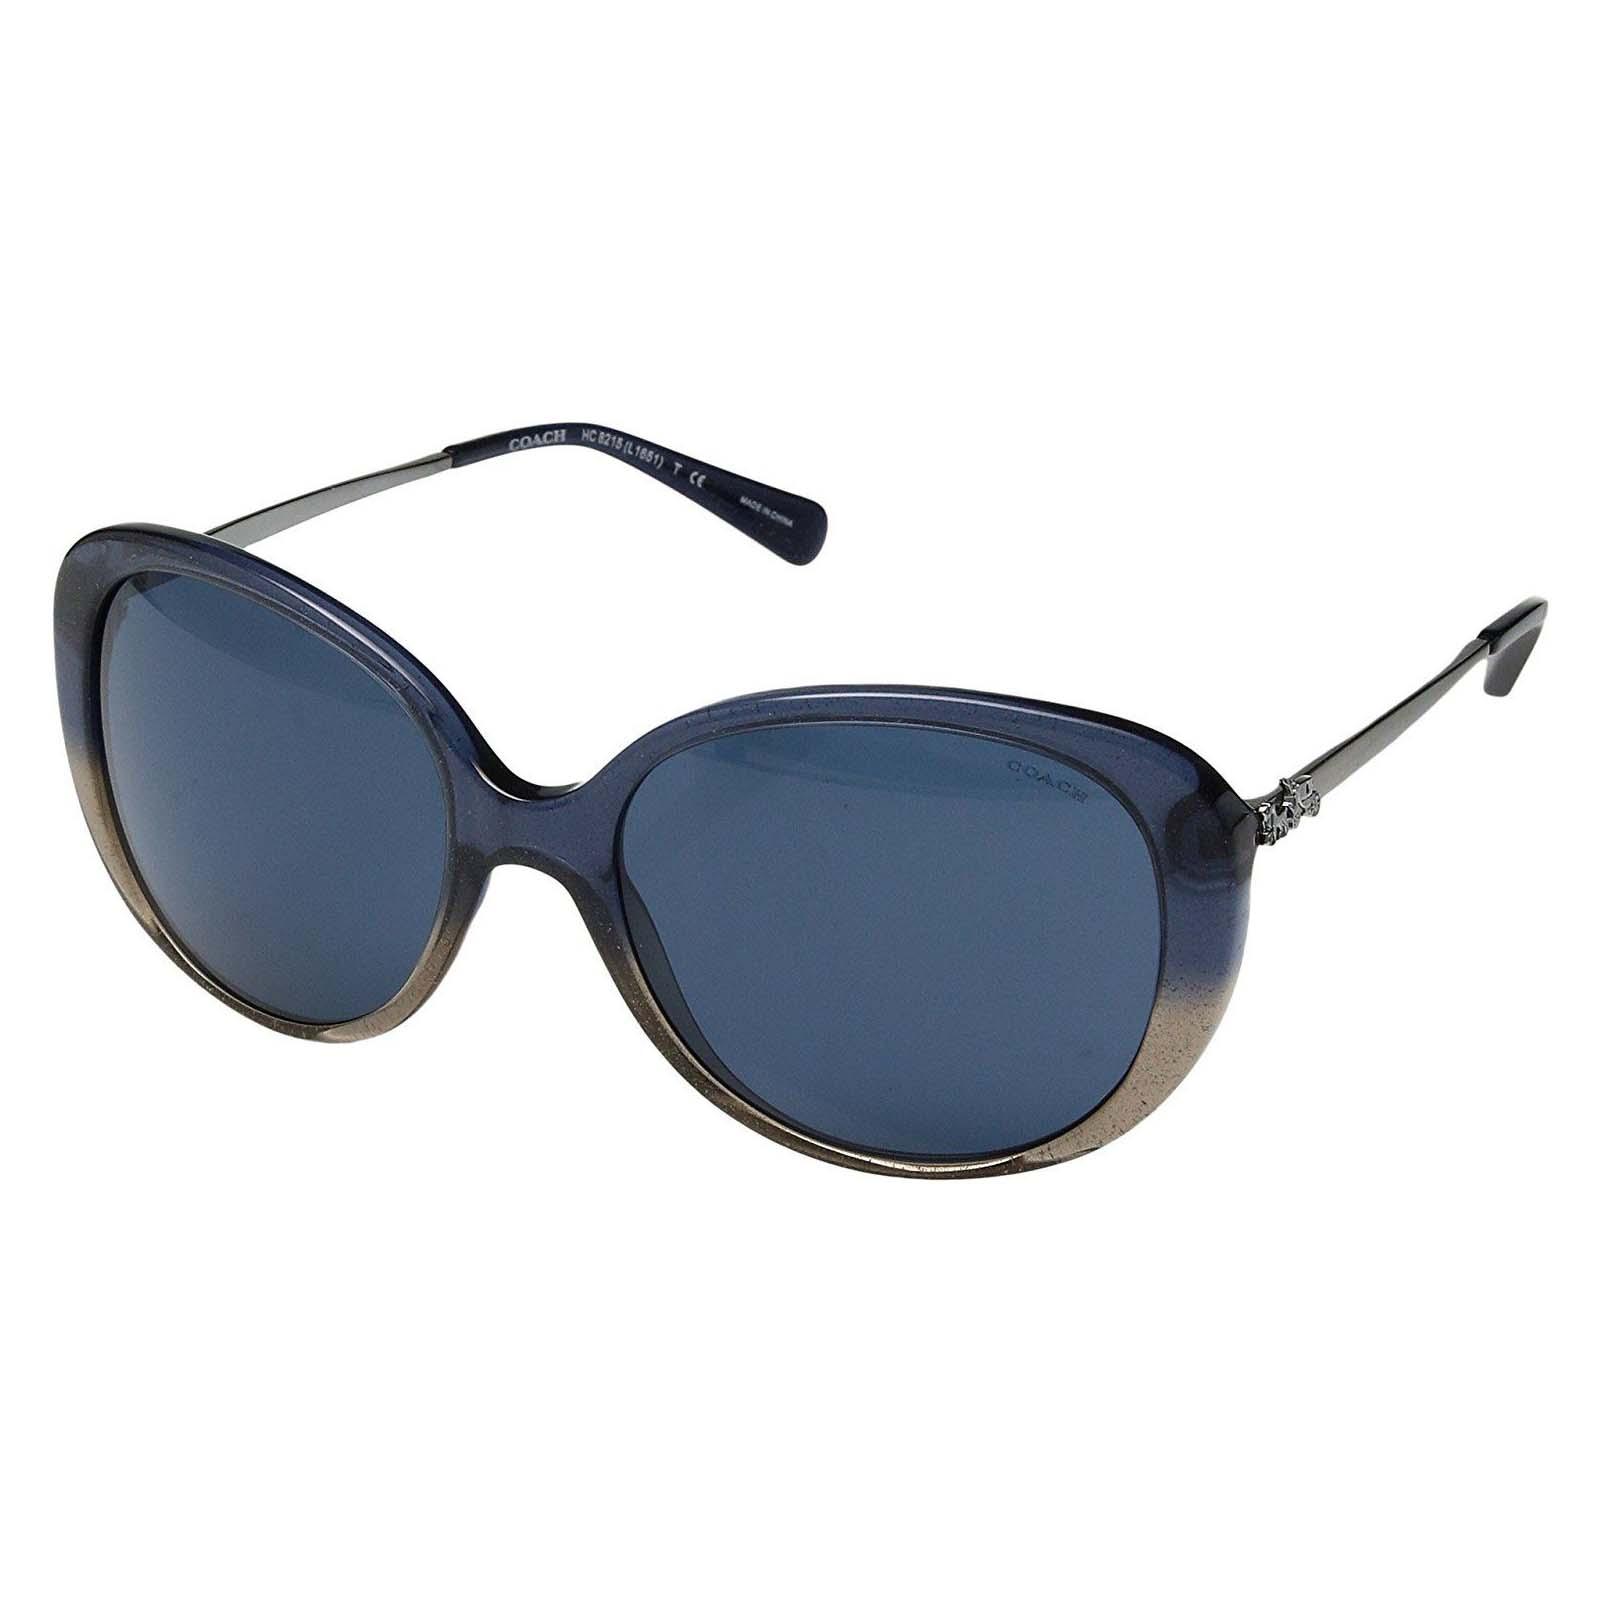 0cfb2a2de8 Coach HC8215 548980 Denim Taupe Glitter Gradient Sunglasses 57-18 ...